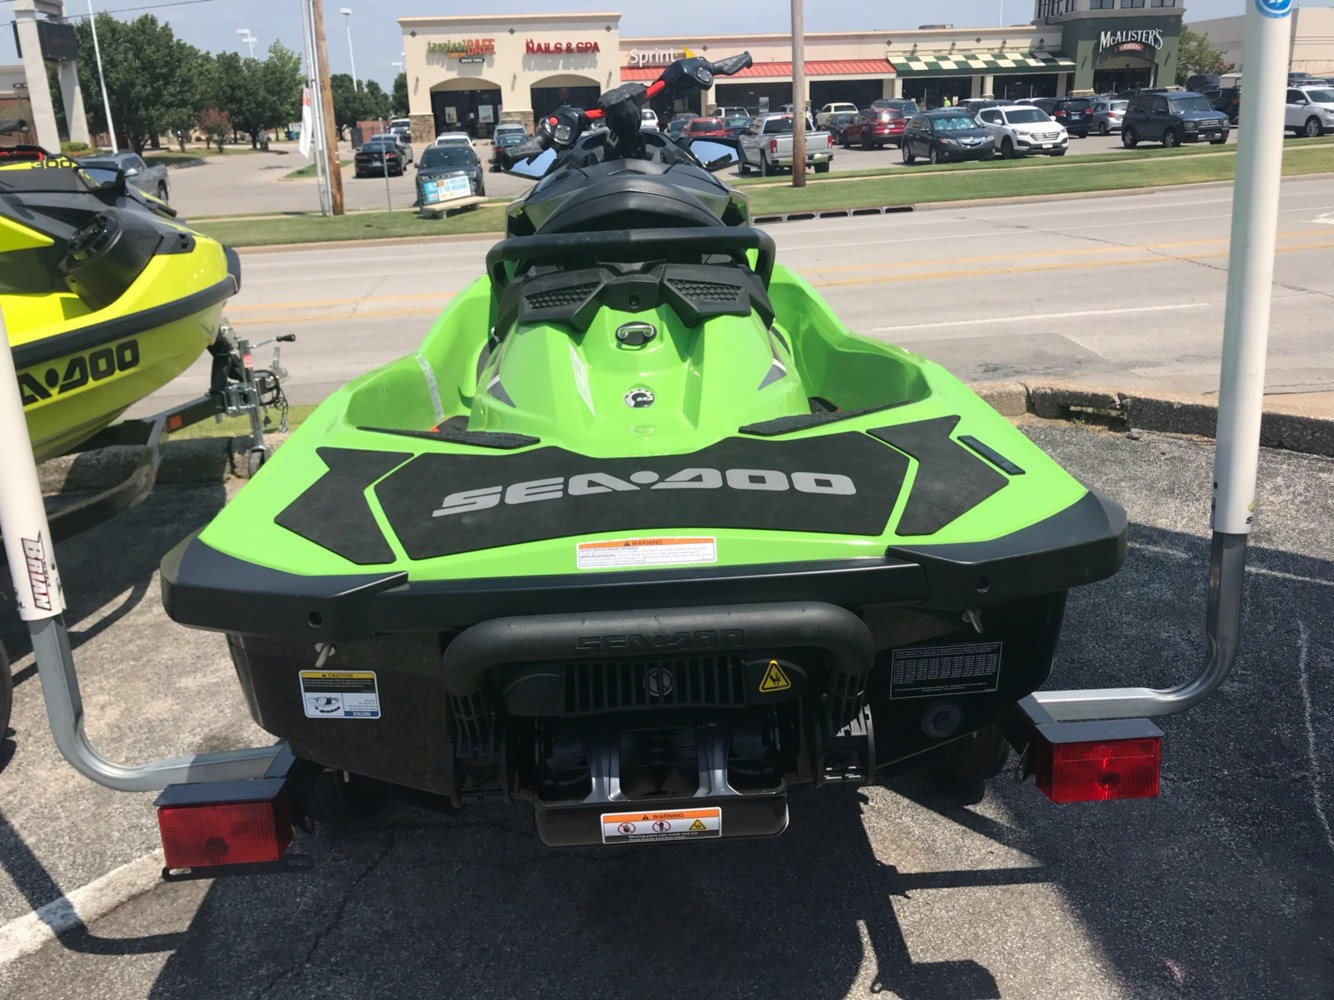 2018 Sea-Doo GTR-X 230 in Tulsa, Oklahoma